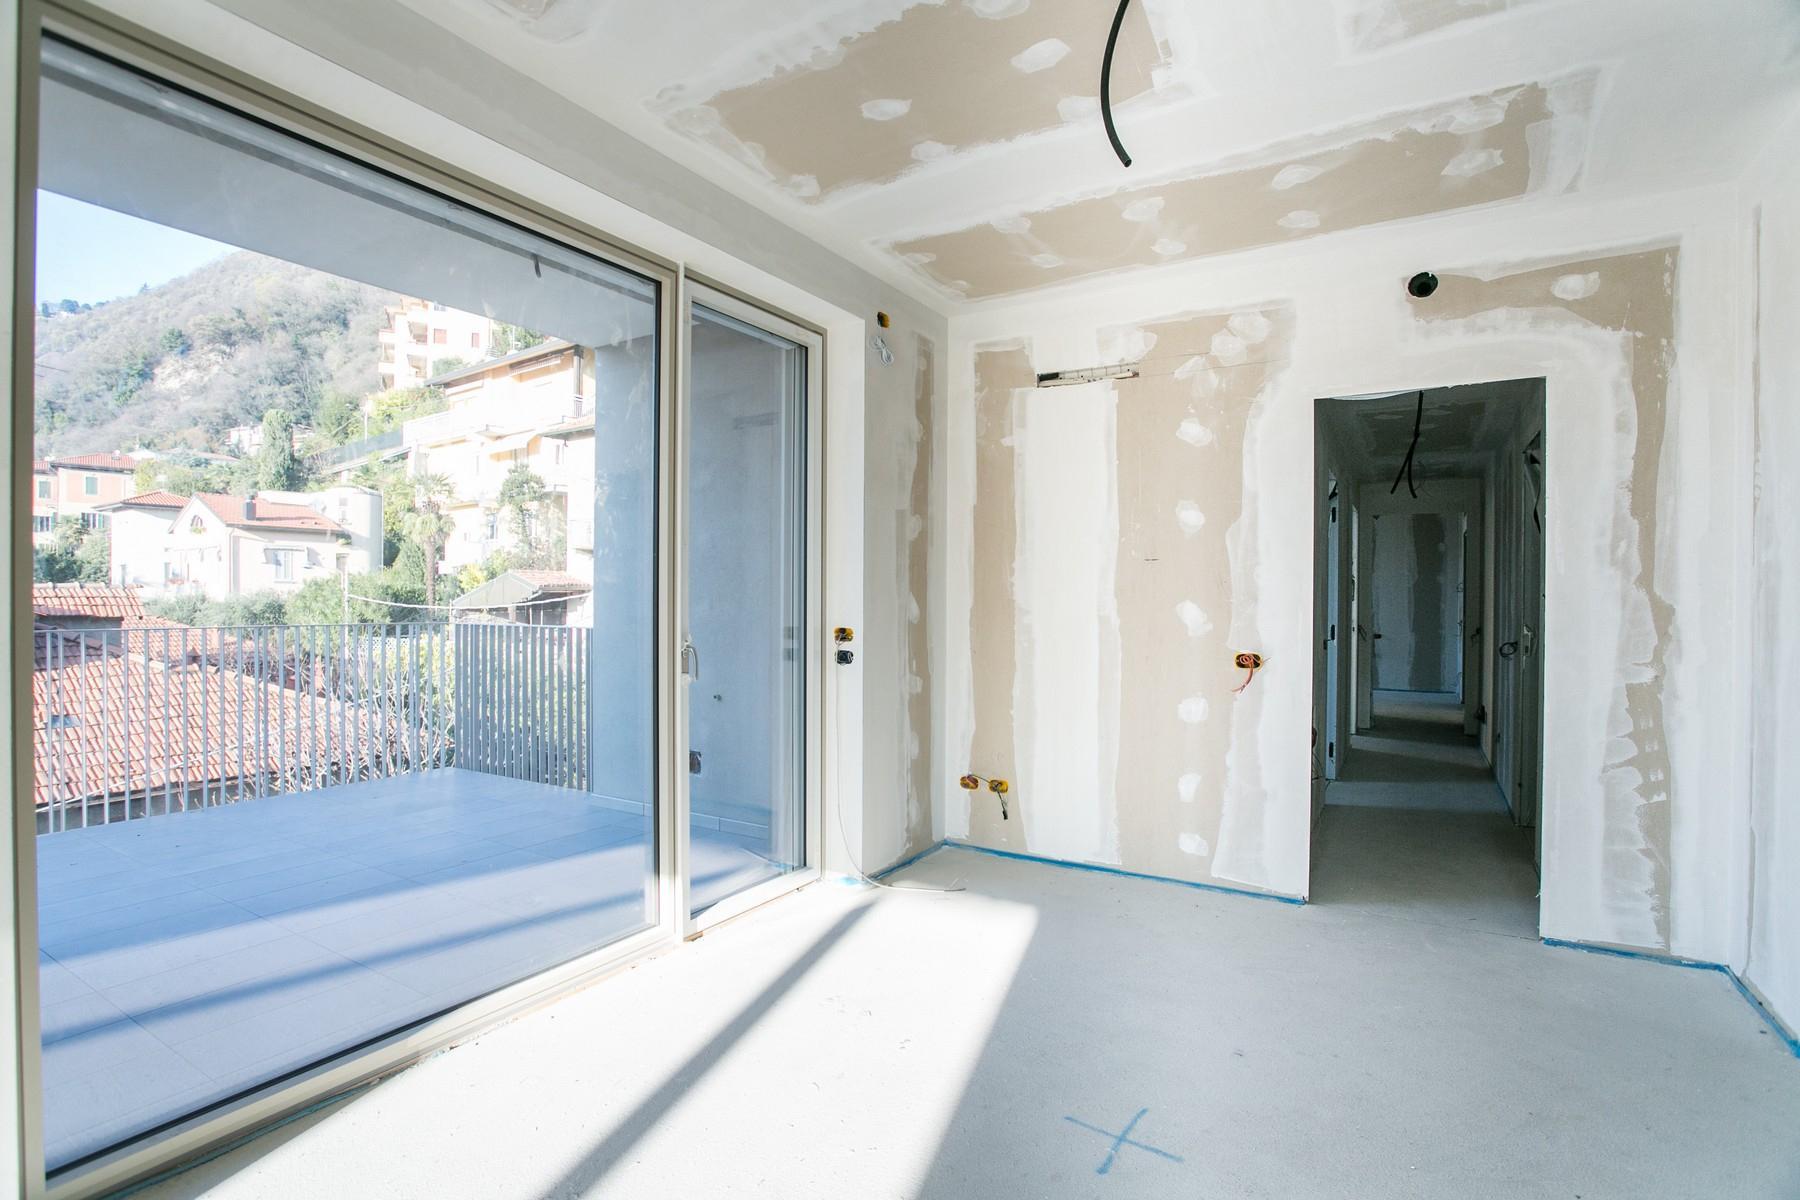 Exclusif appartement neuf en position panoramique - 14